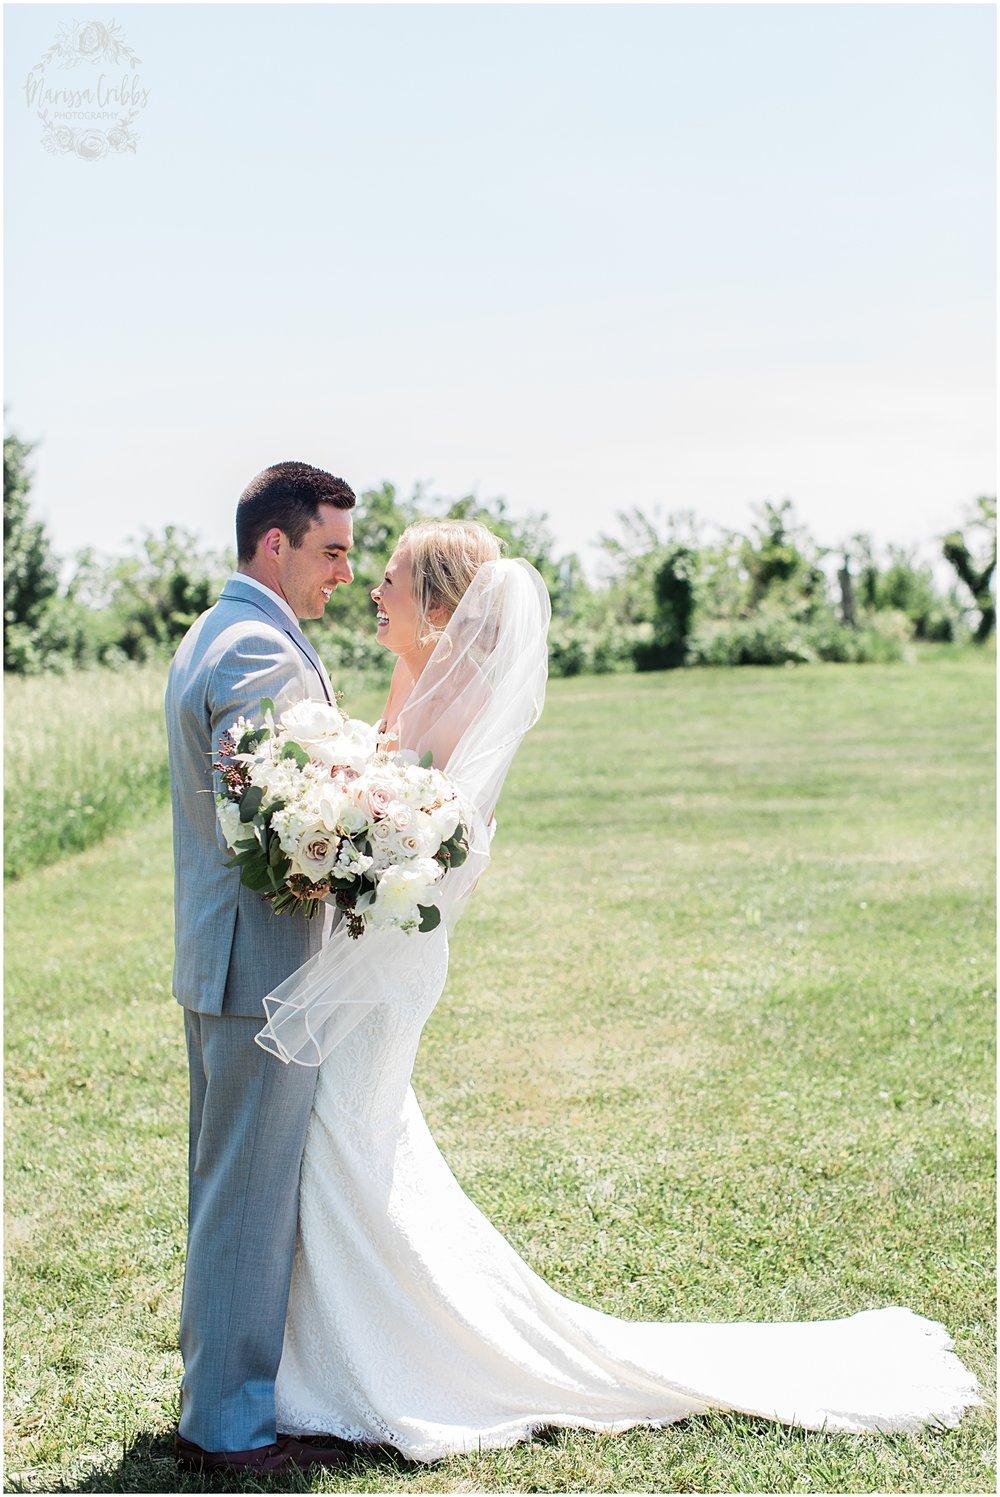 RHODES WEDDING | WESTON RED BARN FARM | MARISSA CRIBBS PHOTOGRAPHY_5224.jpg